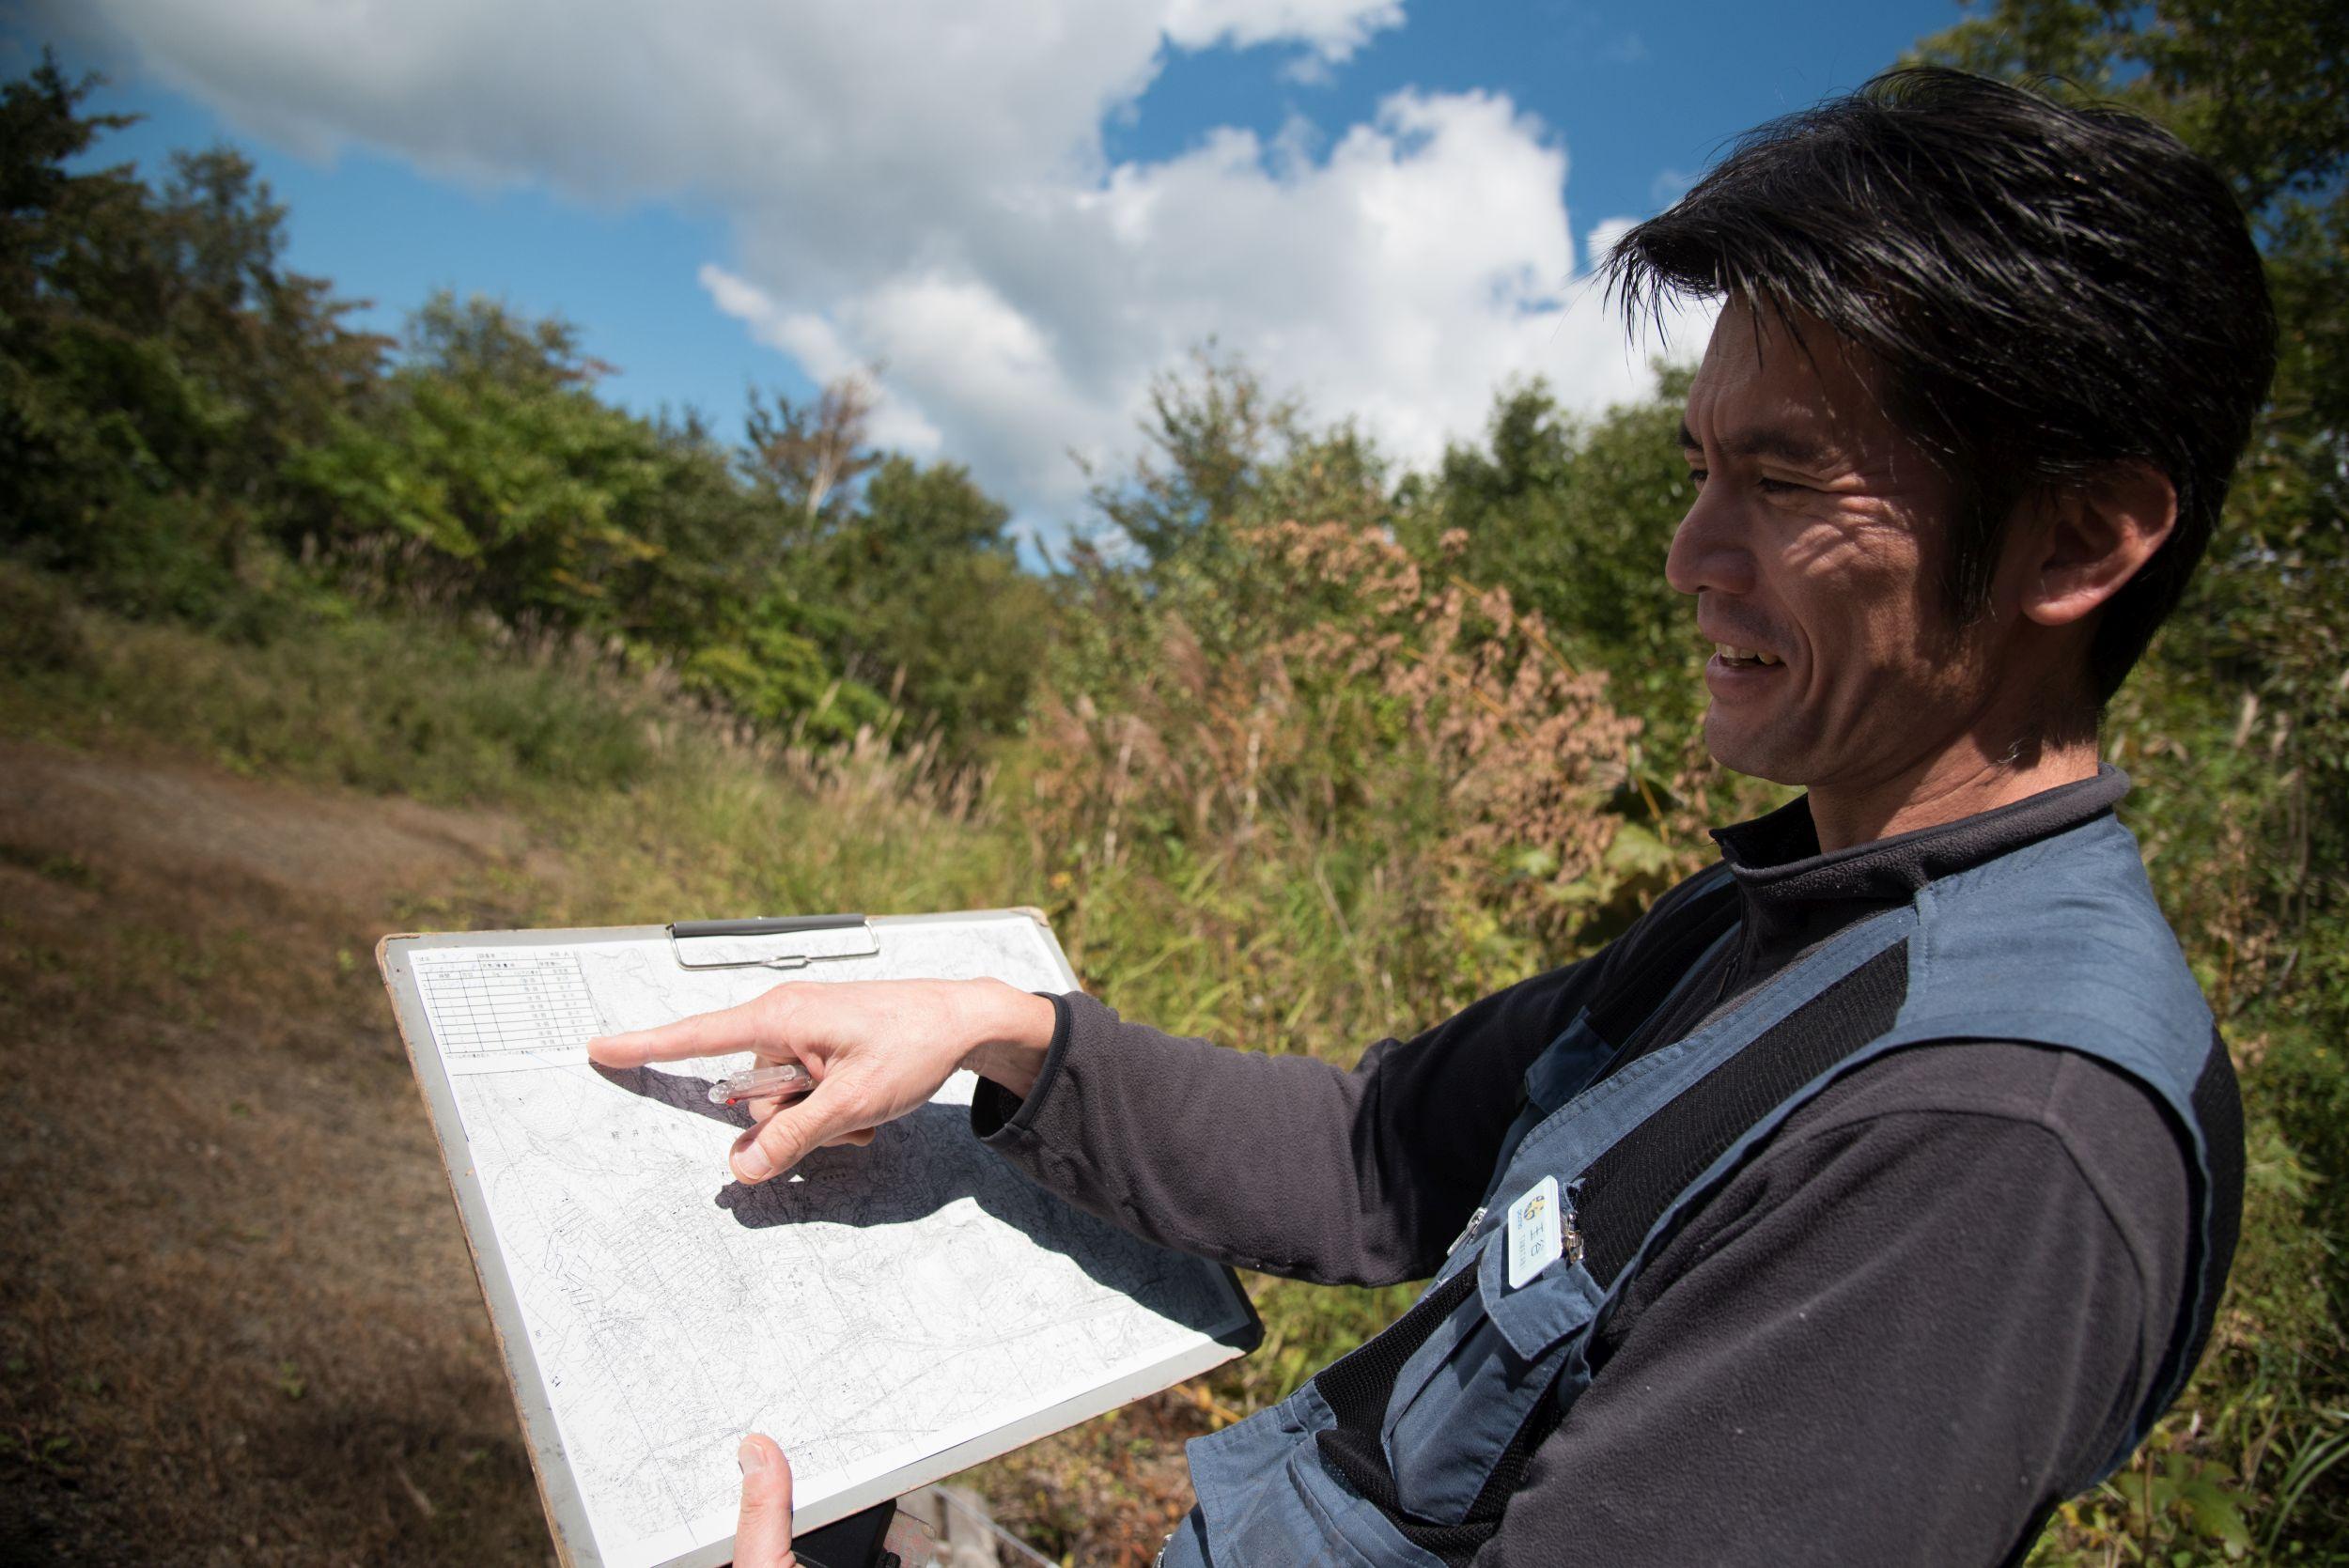 Tamatani researcher Hiroo records data from the Asian black bear (Sarah Marshall / PA)